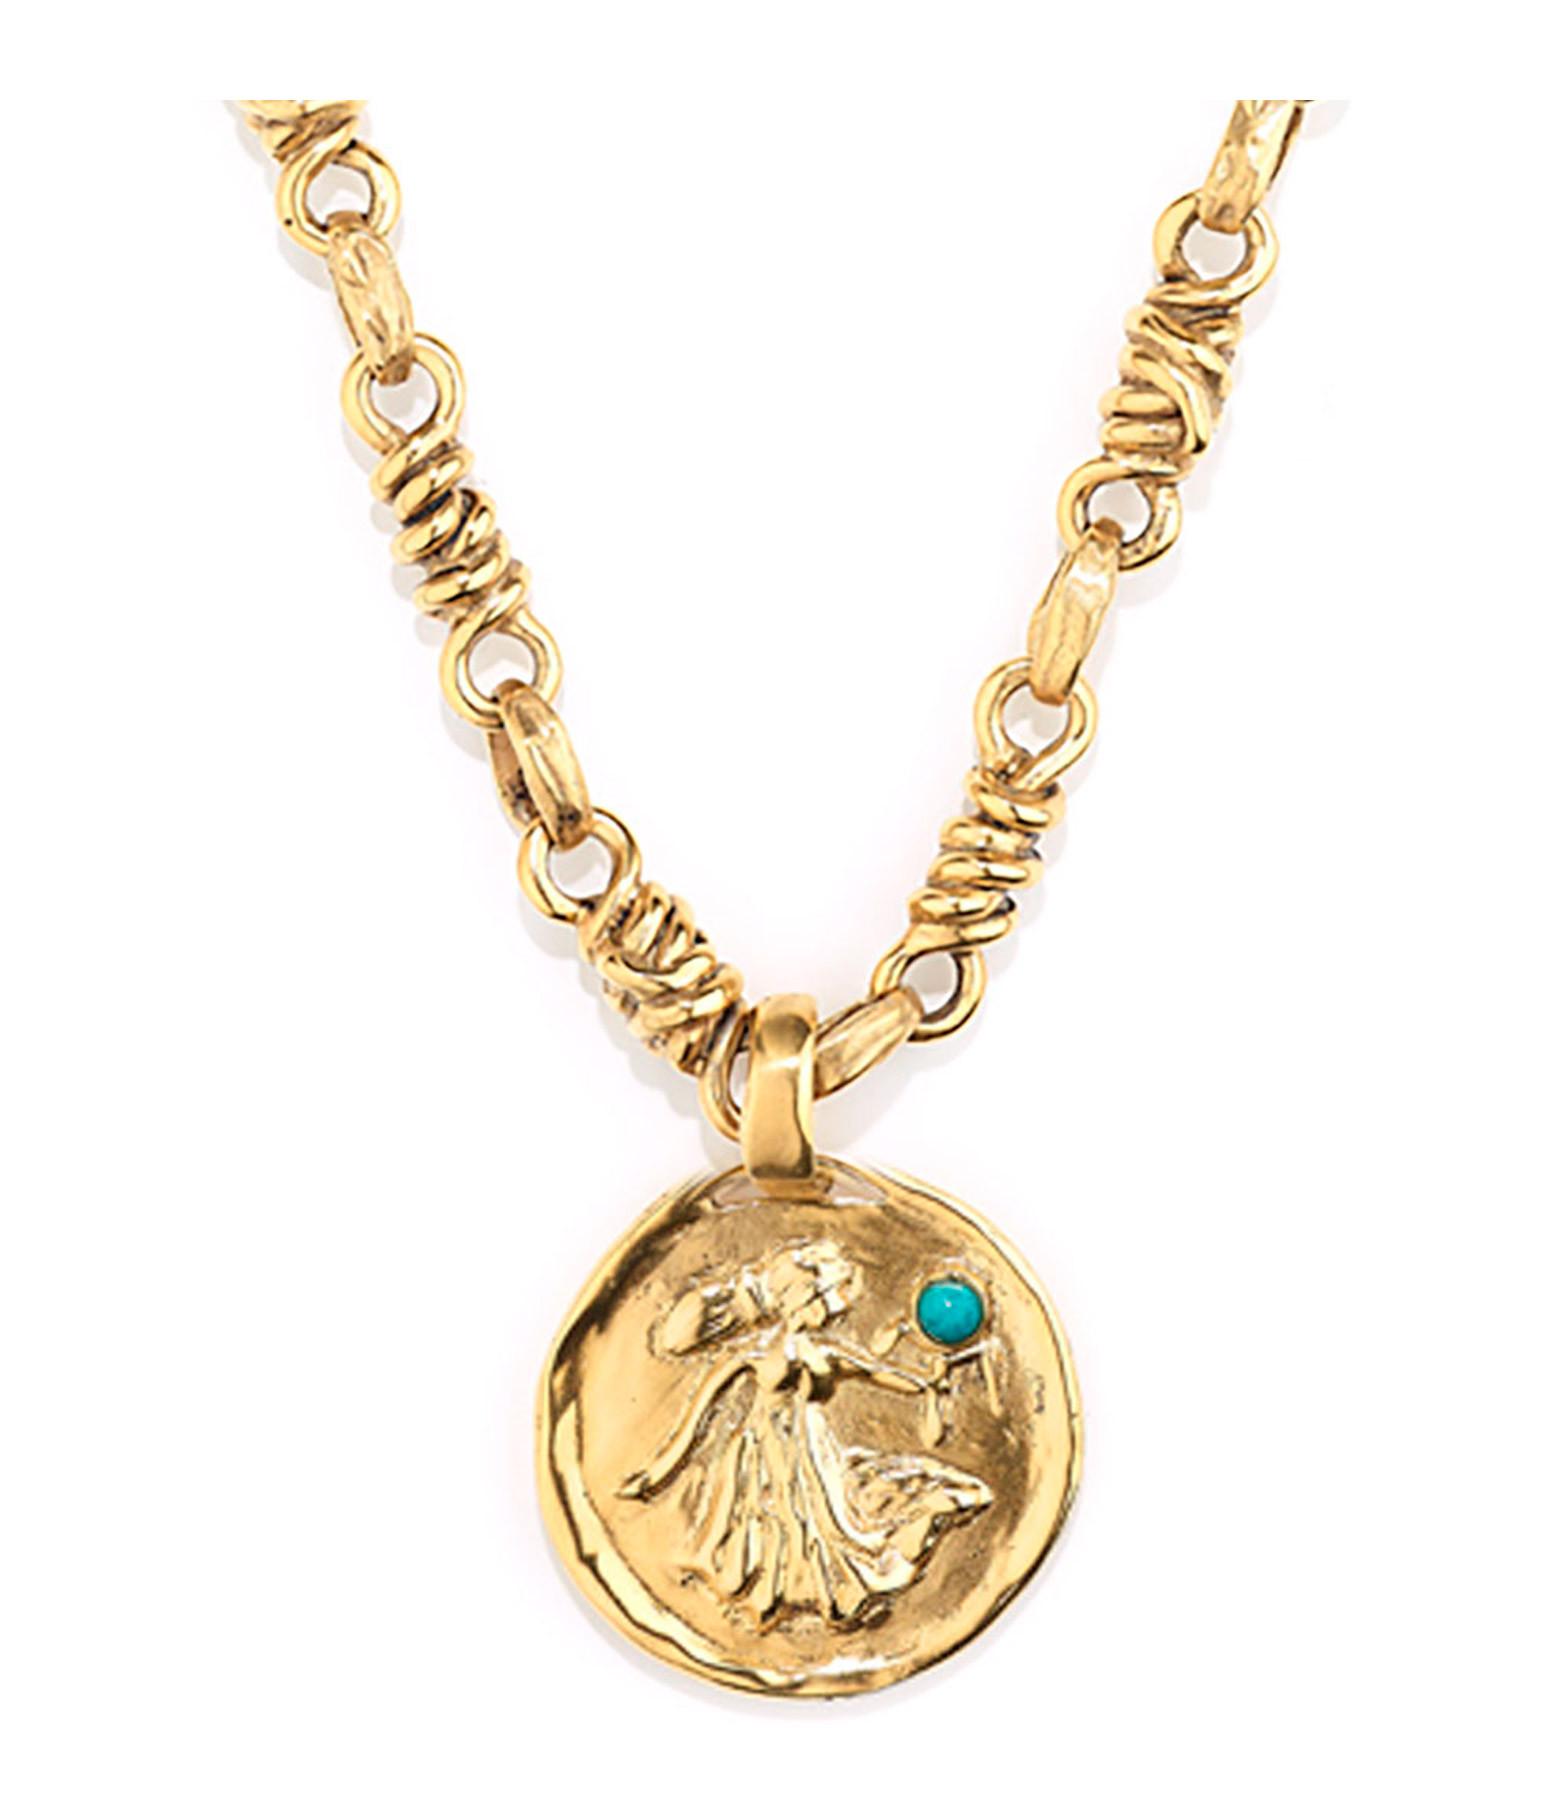 GOOSSENS - Collier Talisman Astro Vierge Turquoise